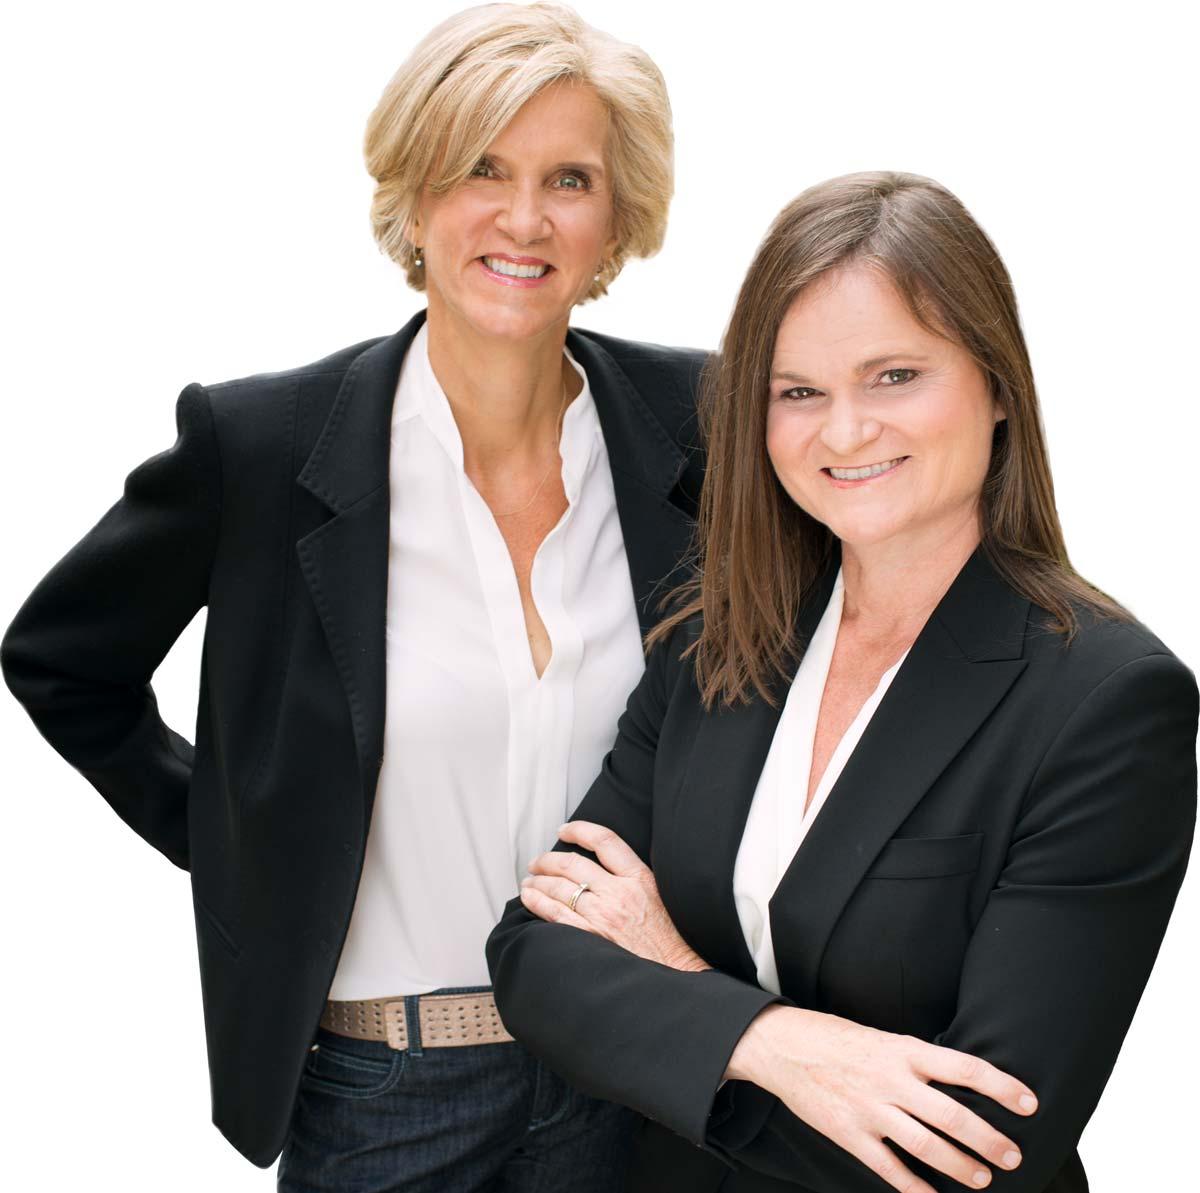 Lotte Moore & Sarah Kowalczyk